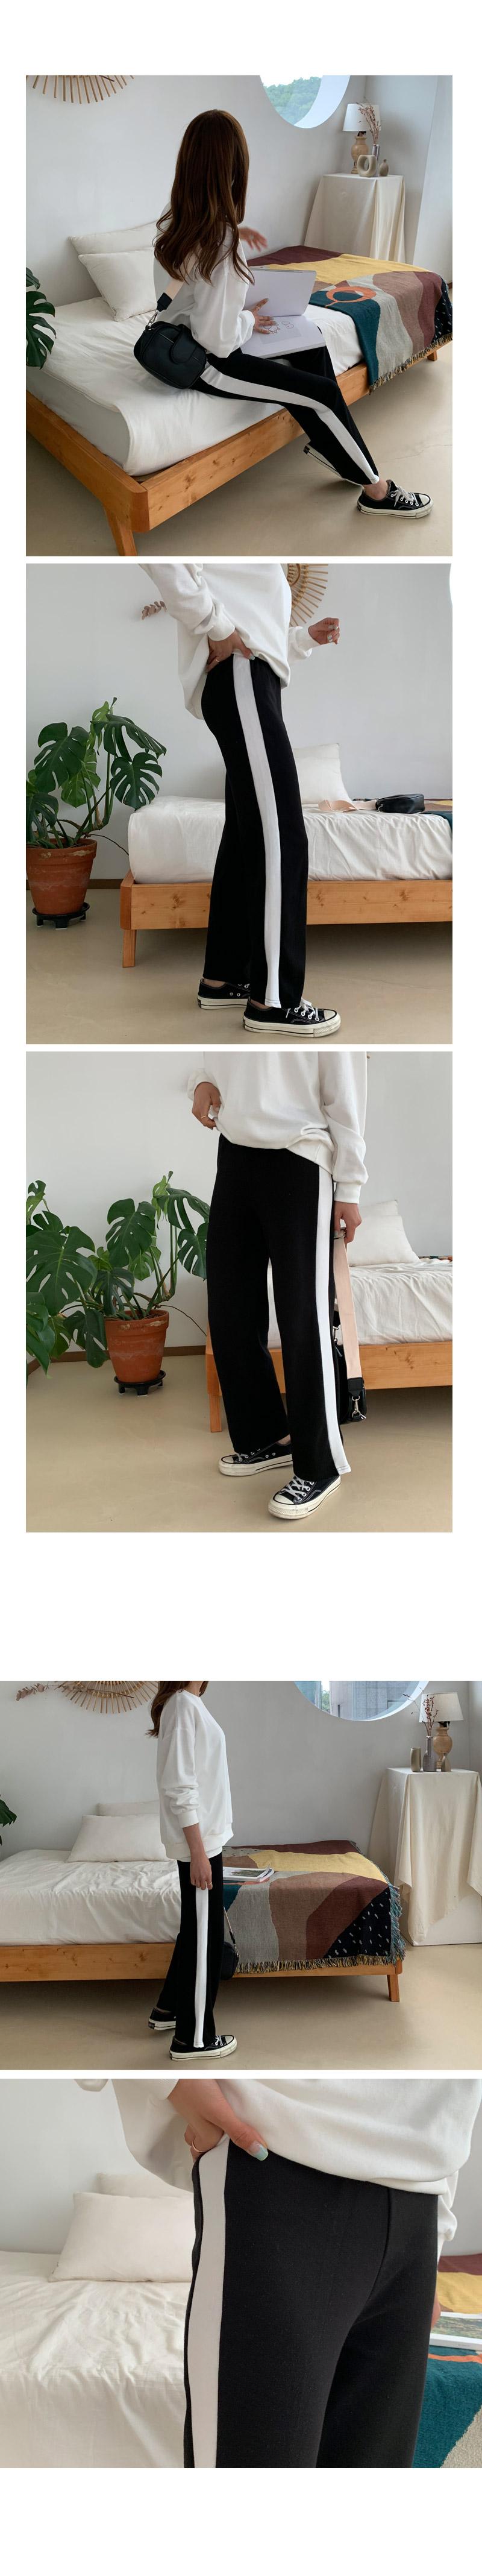 Matthew Line Banding Pants